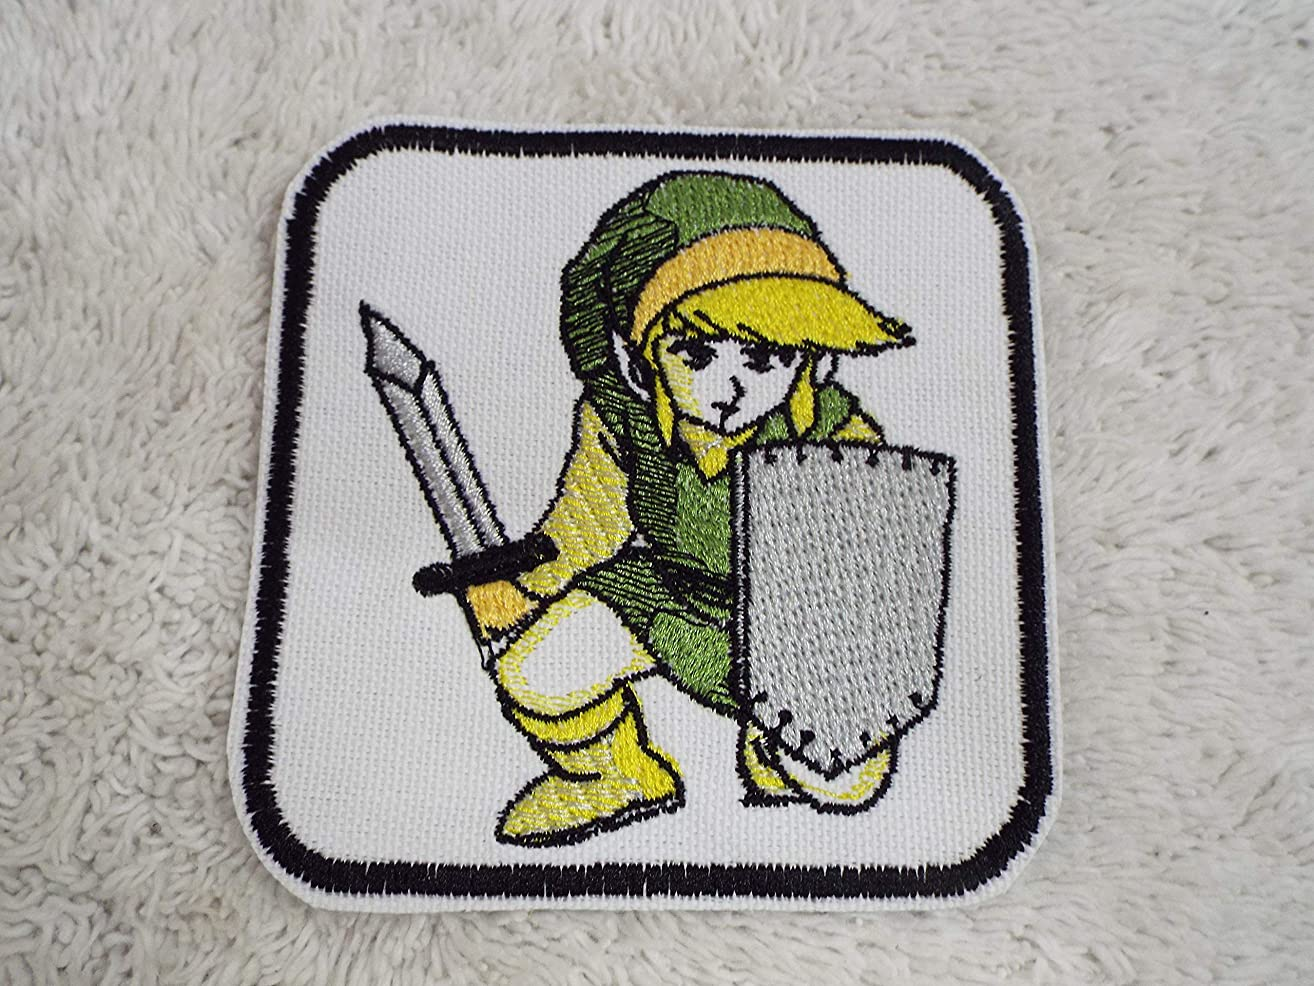 Legend of Zelda Game Green LINK Kneeling Sword Embroidered Iron-on Patch